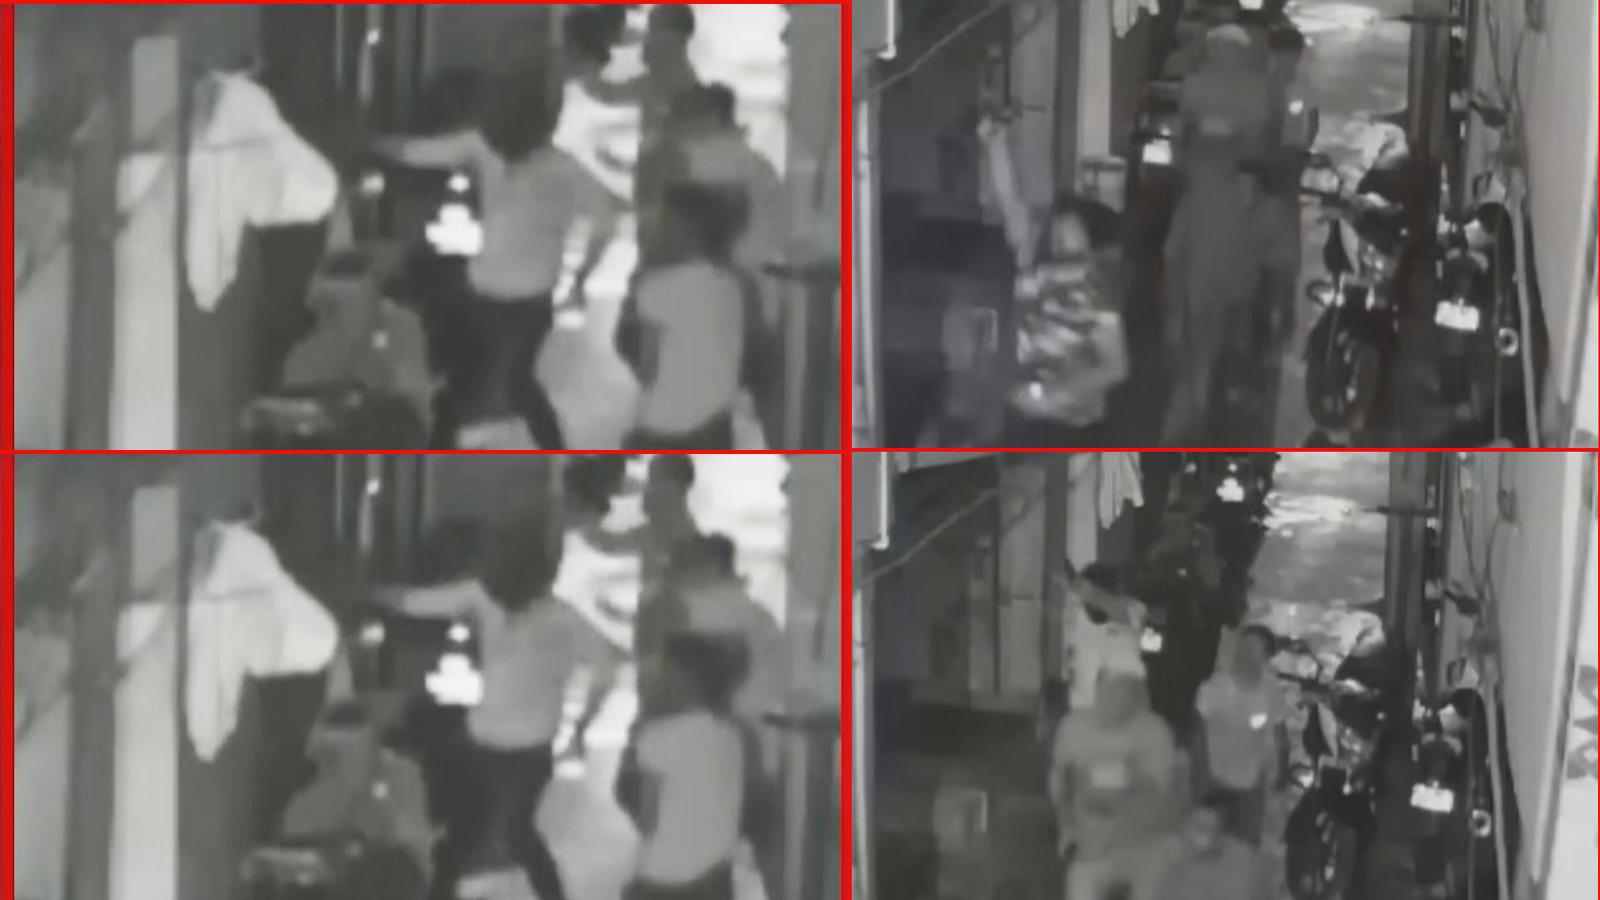 cctv-footage-goons-shot-a-man-in-delhis-jahangirpuri